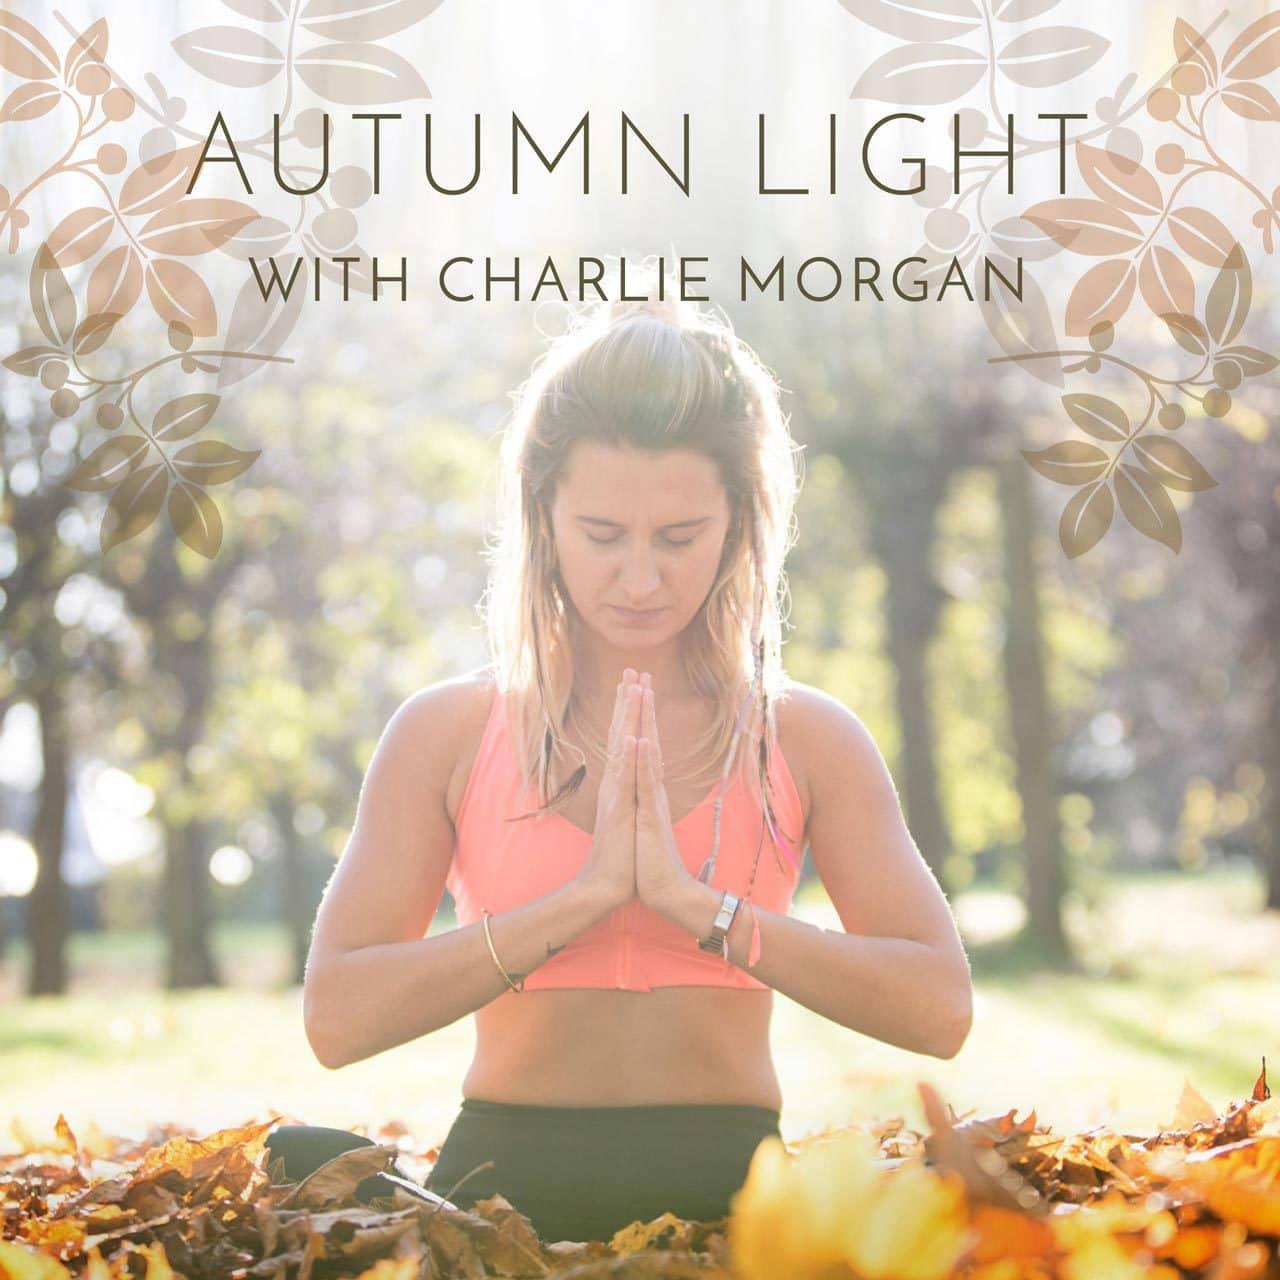 Autumn Light yoga retreat with Charlie Morgan